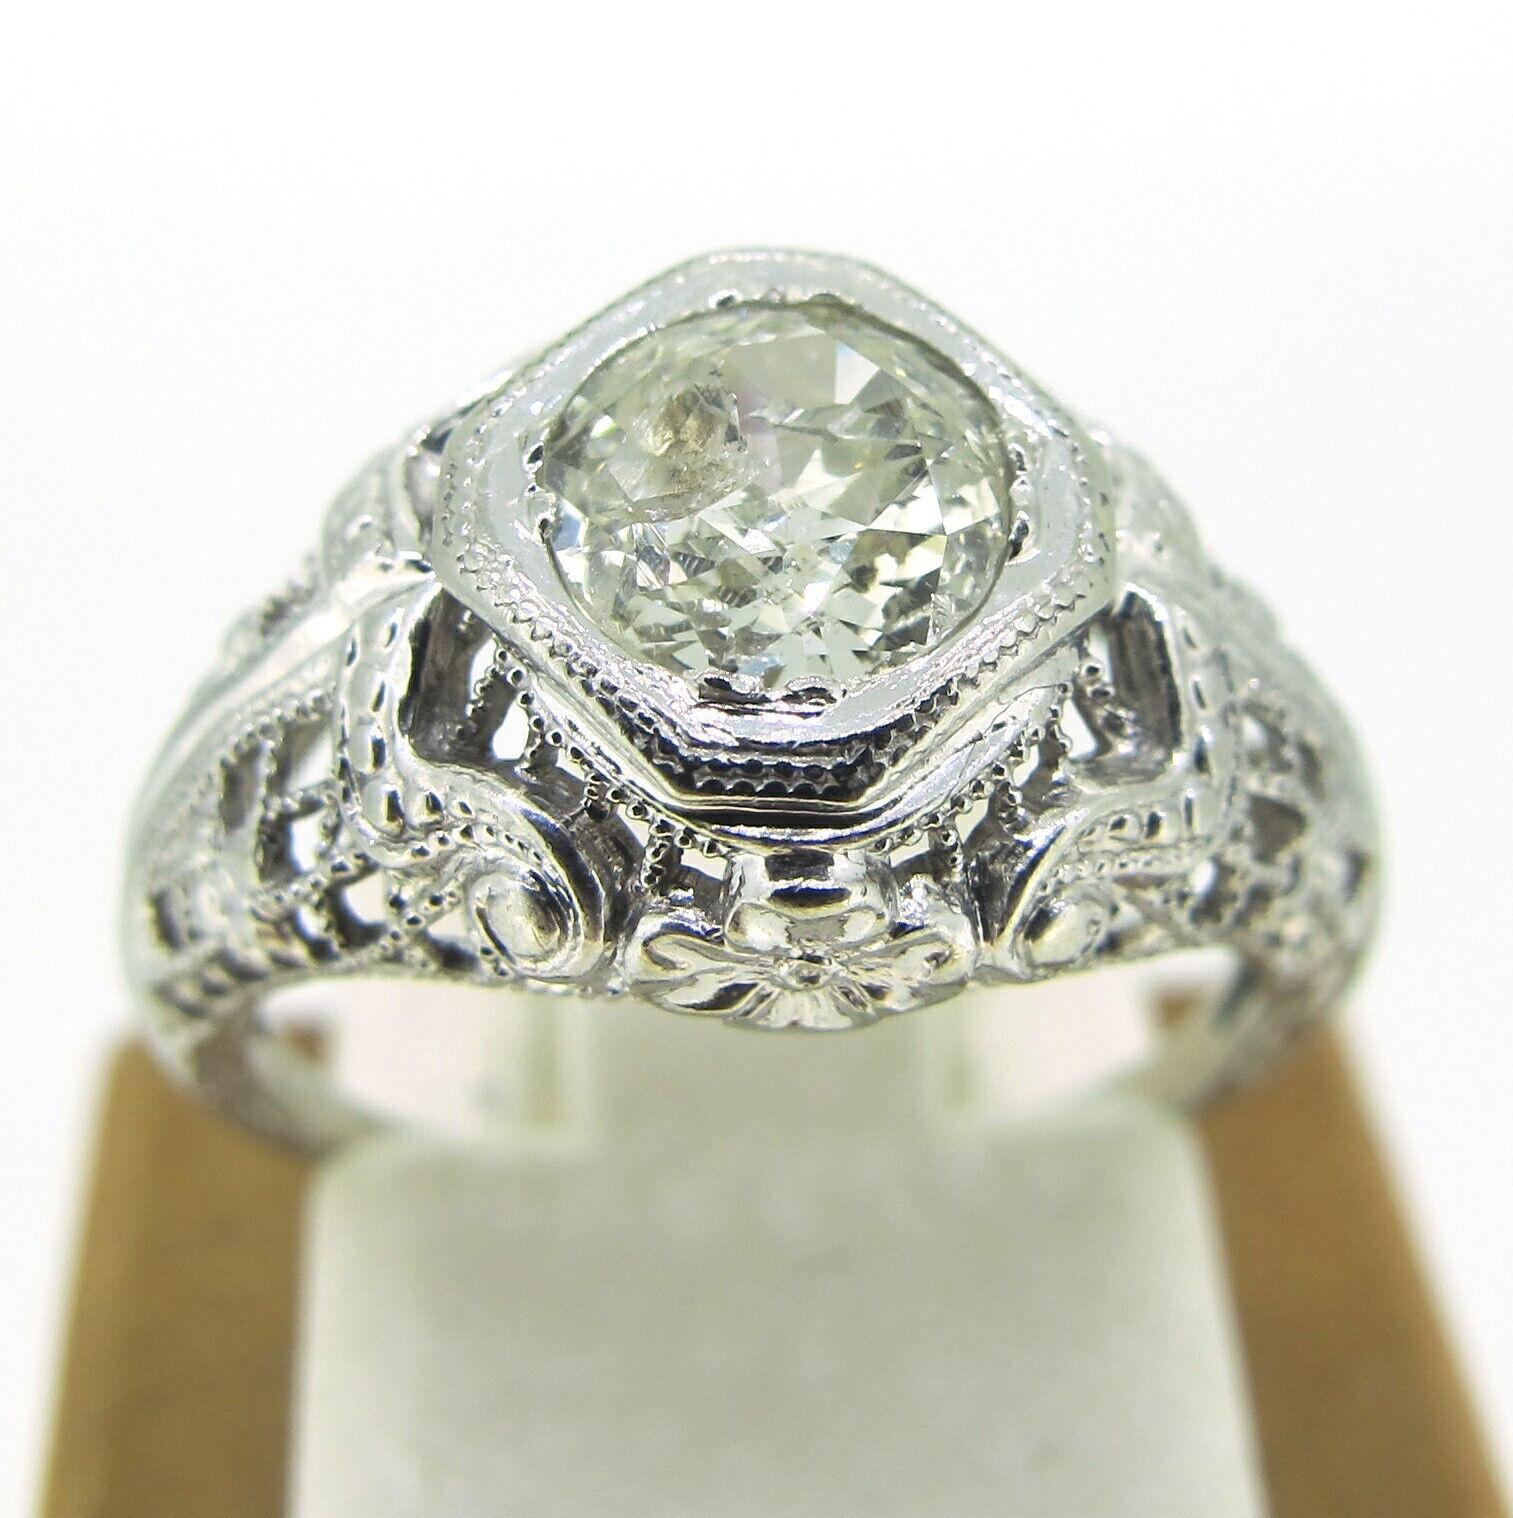 .62 ct Diamond Old European Cut 18k White gold Estate Ring Size 4.25